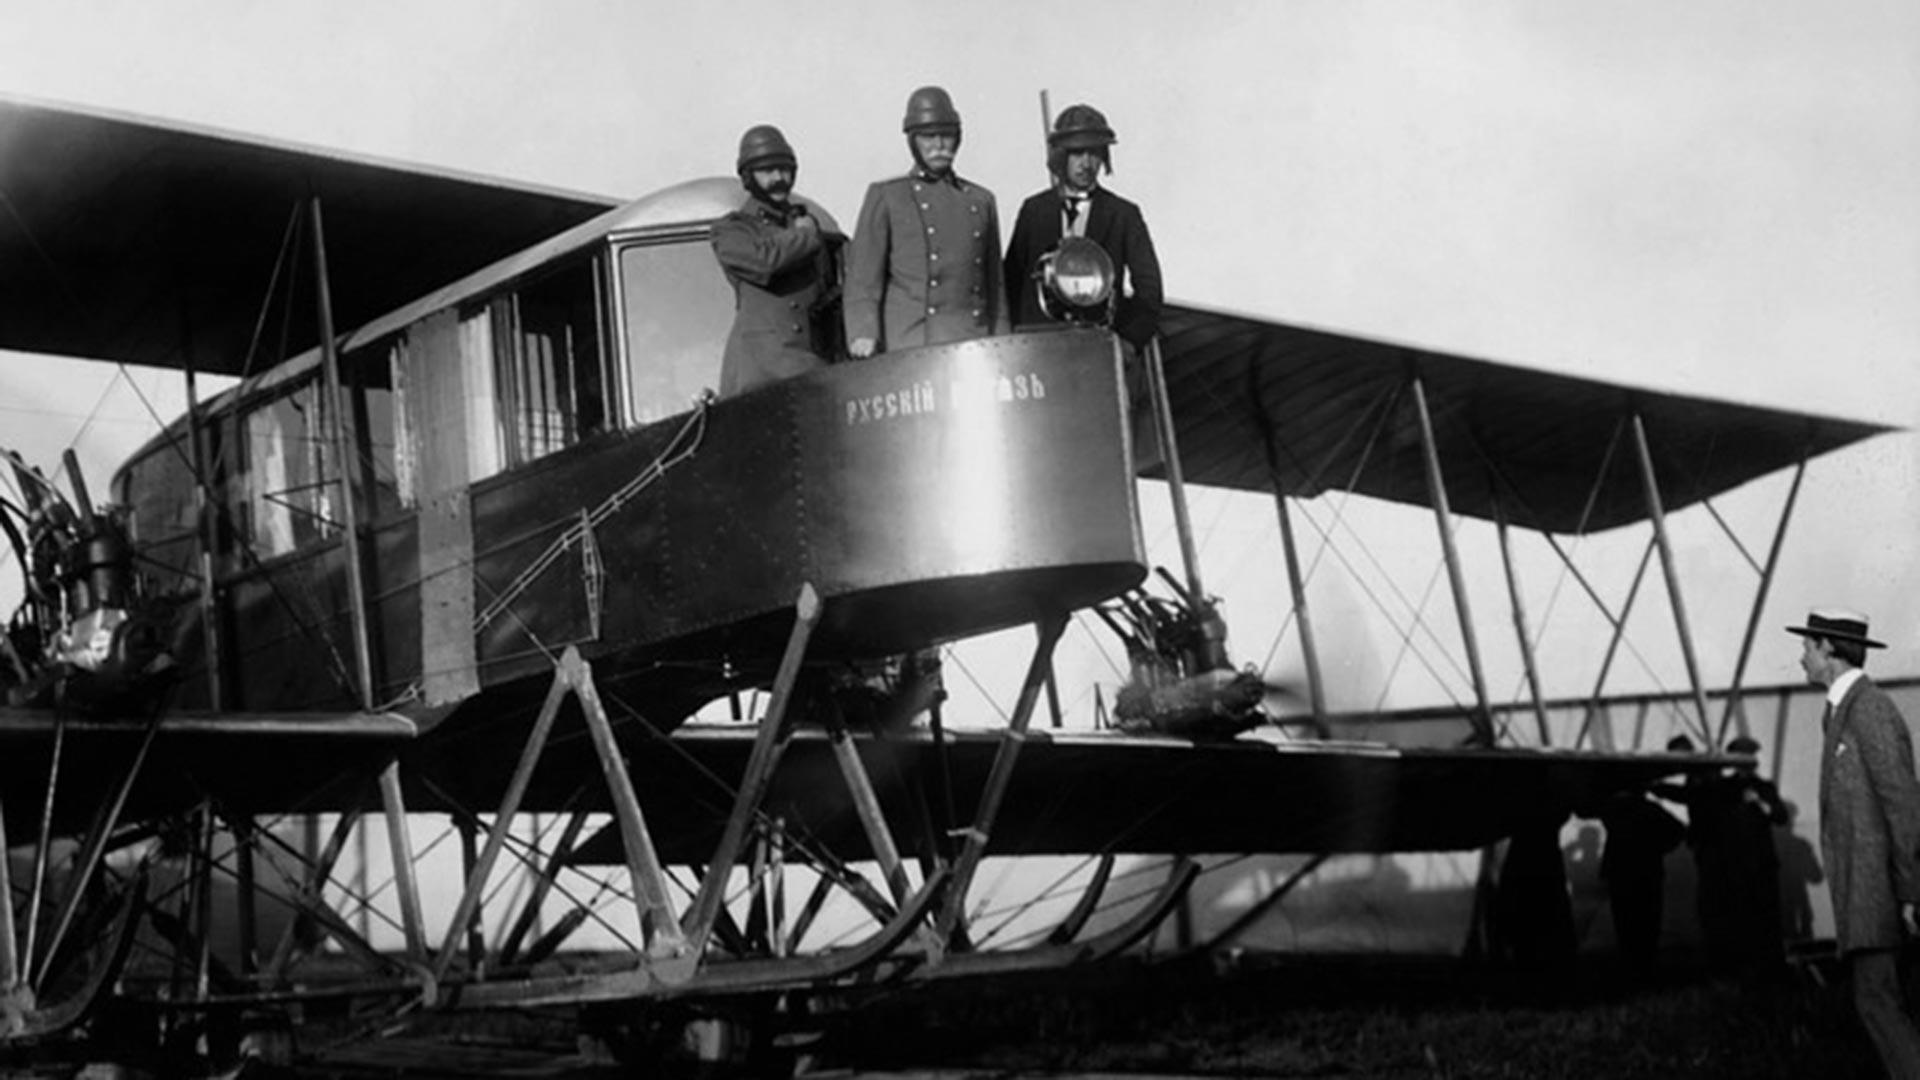 Aviation pioneer Igor Sikorsky (R).